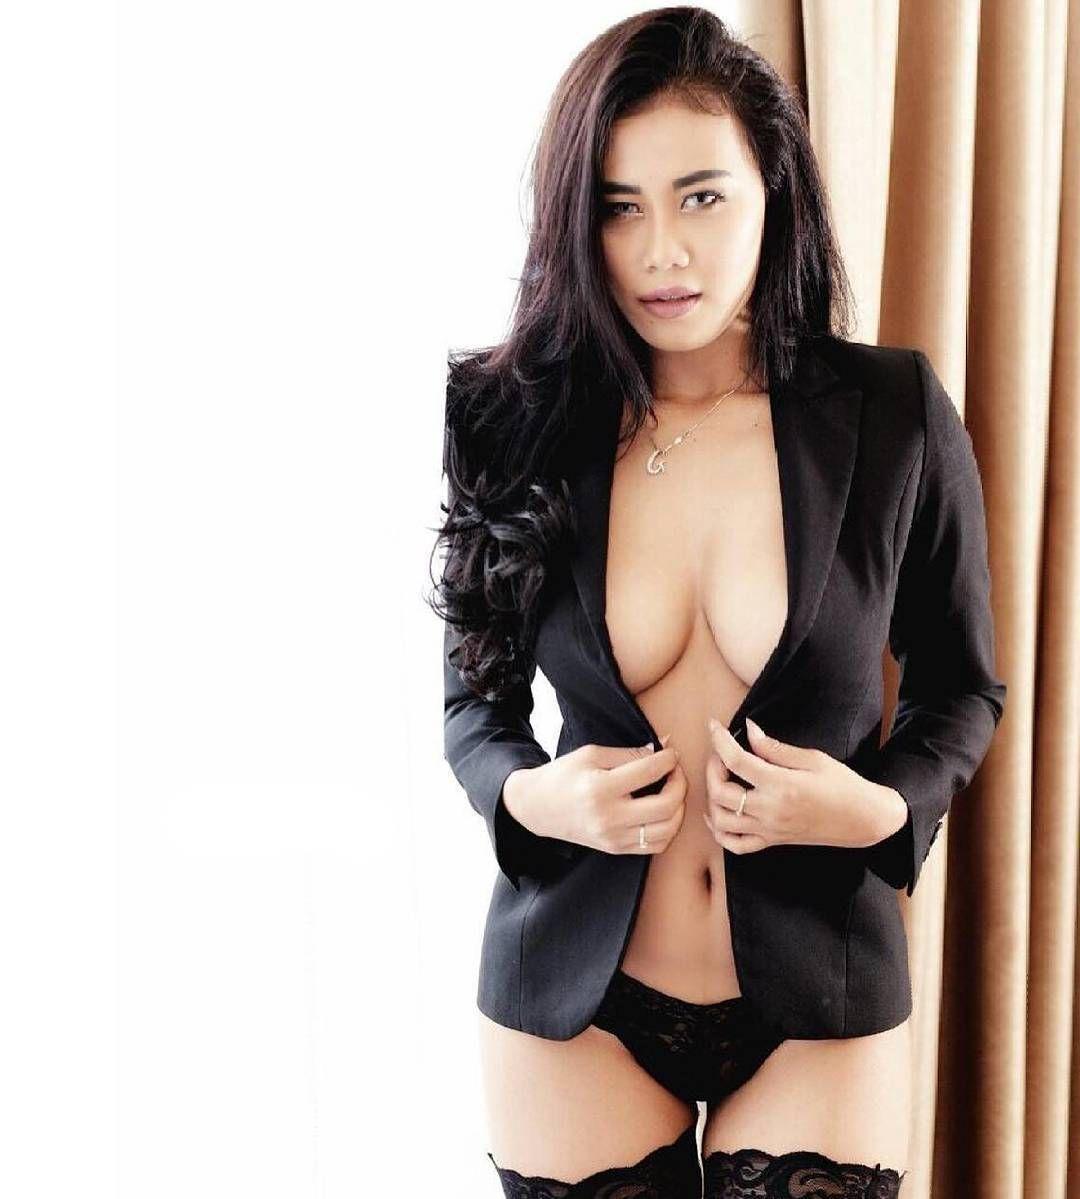 Gavriena Astaris Modelcantik Modelseksi Model Modelbugil Modelhot Modelindonesia Indonesiamodel Photografi Cewekseksi Cewekcantik Gavrienaastaris